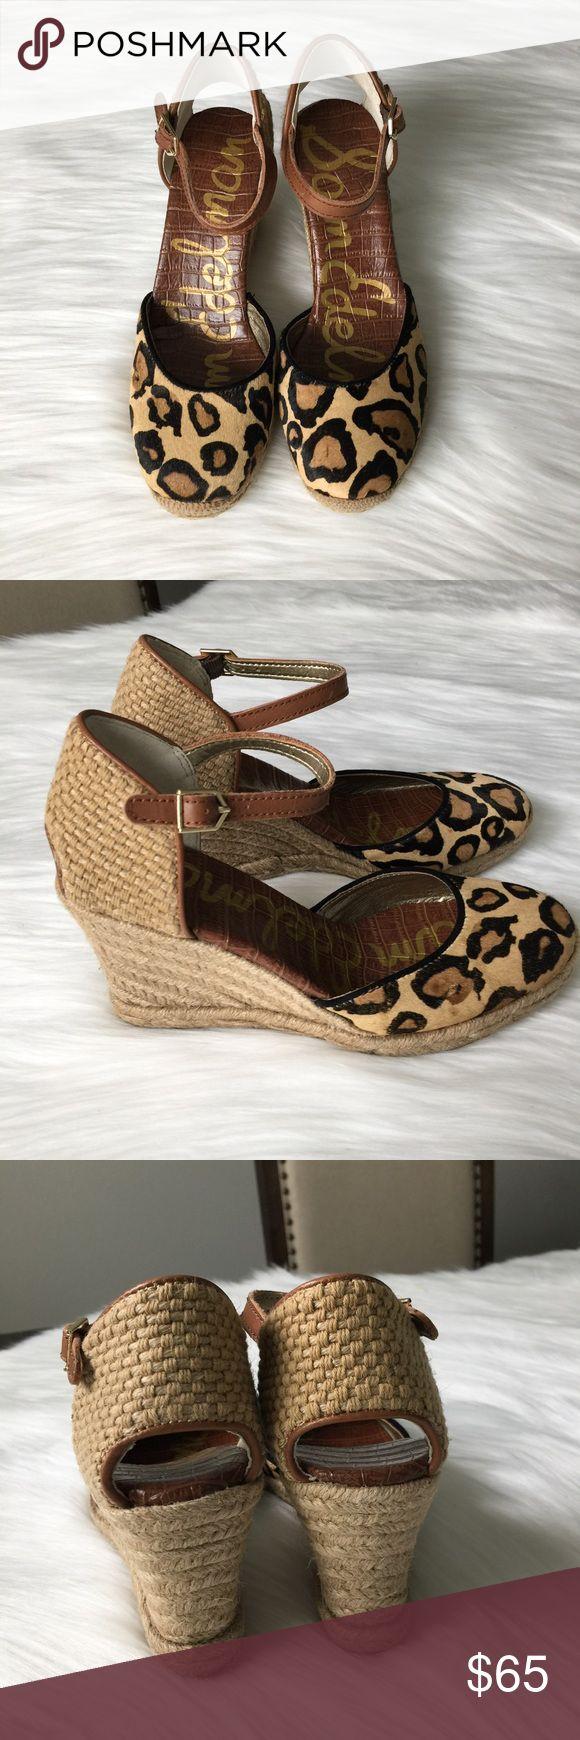 Sam Edelman Leopard Espadrilles Wedge Size 5 Super cute! Brand new with box. 100% authentic. Size 6. Sam Edelman Shoes Wedges